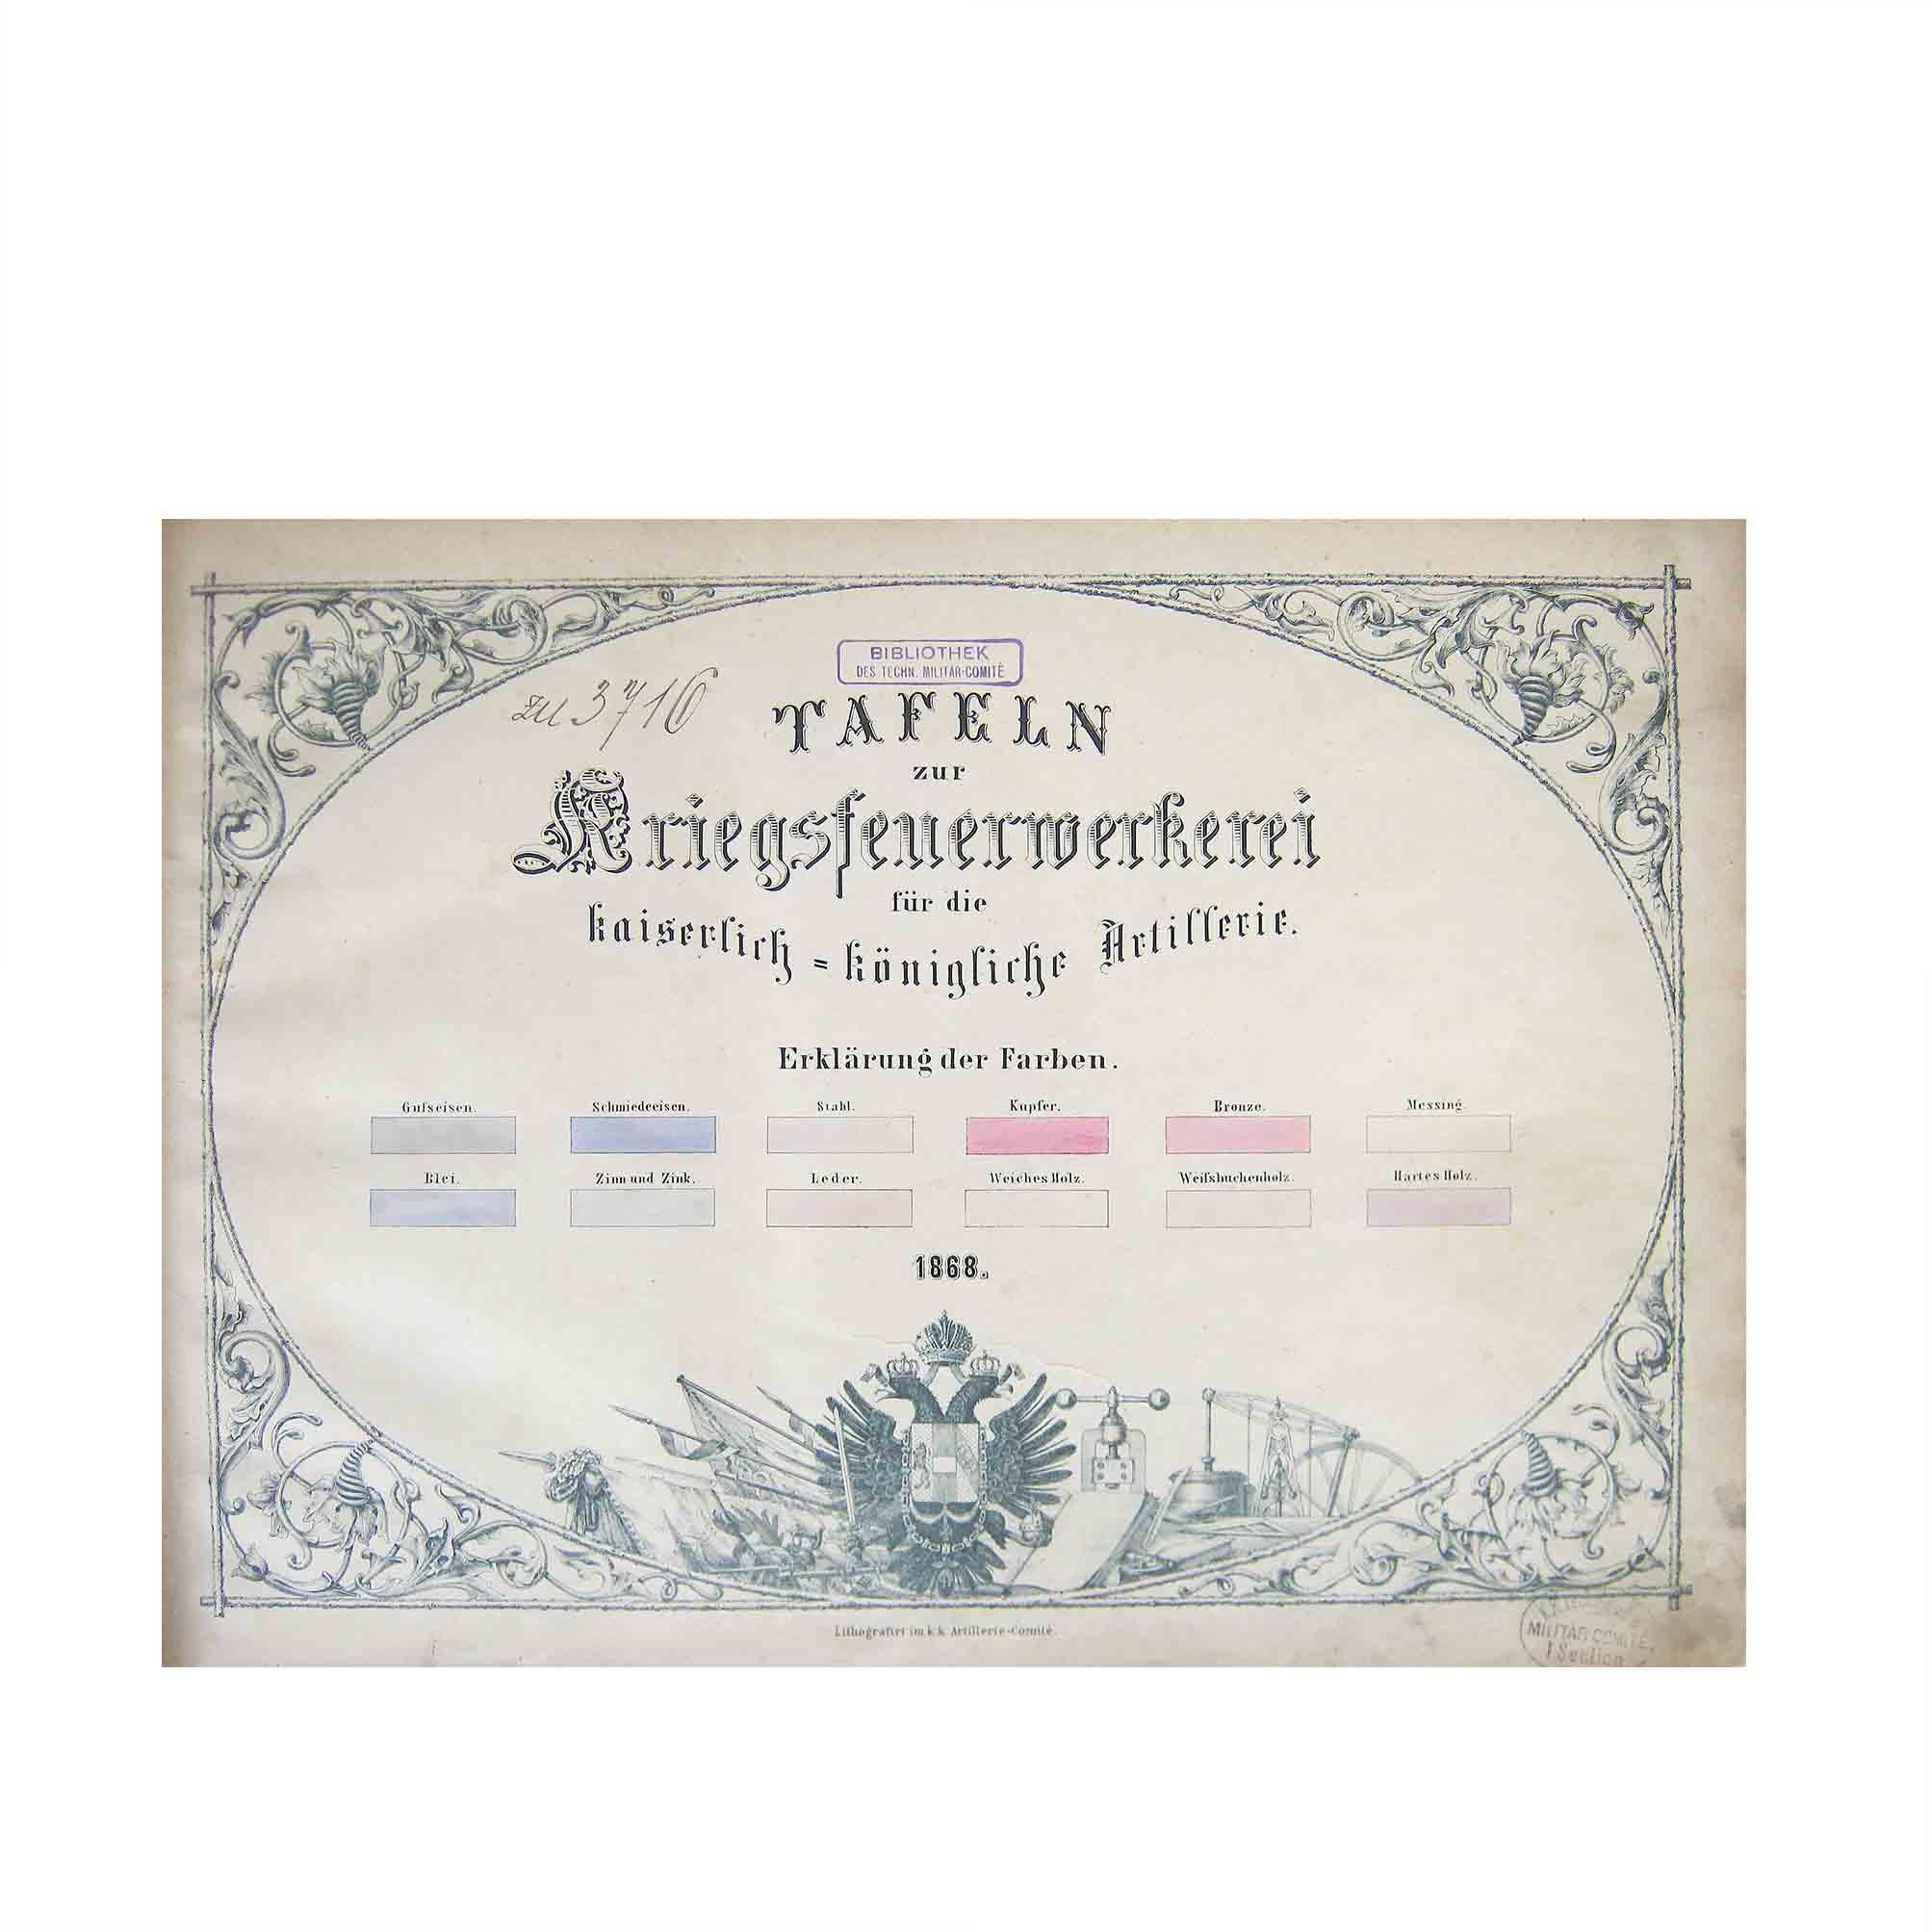 5502-Tafeln-Kriegsfeuerwerkerei-1868-Titel-A-N.jpg